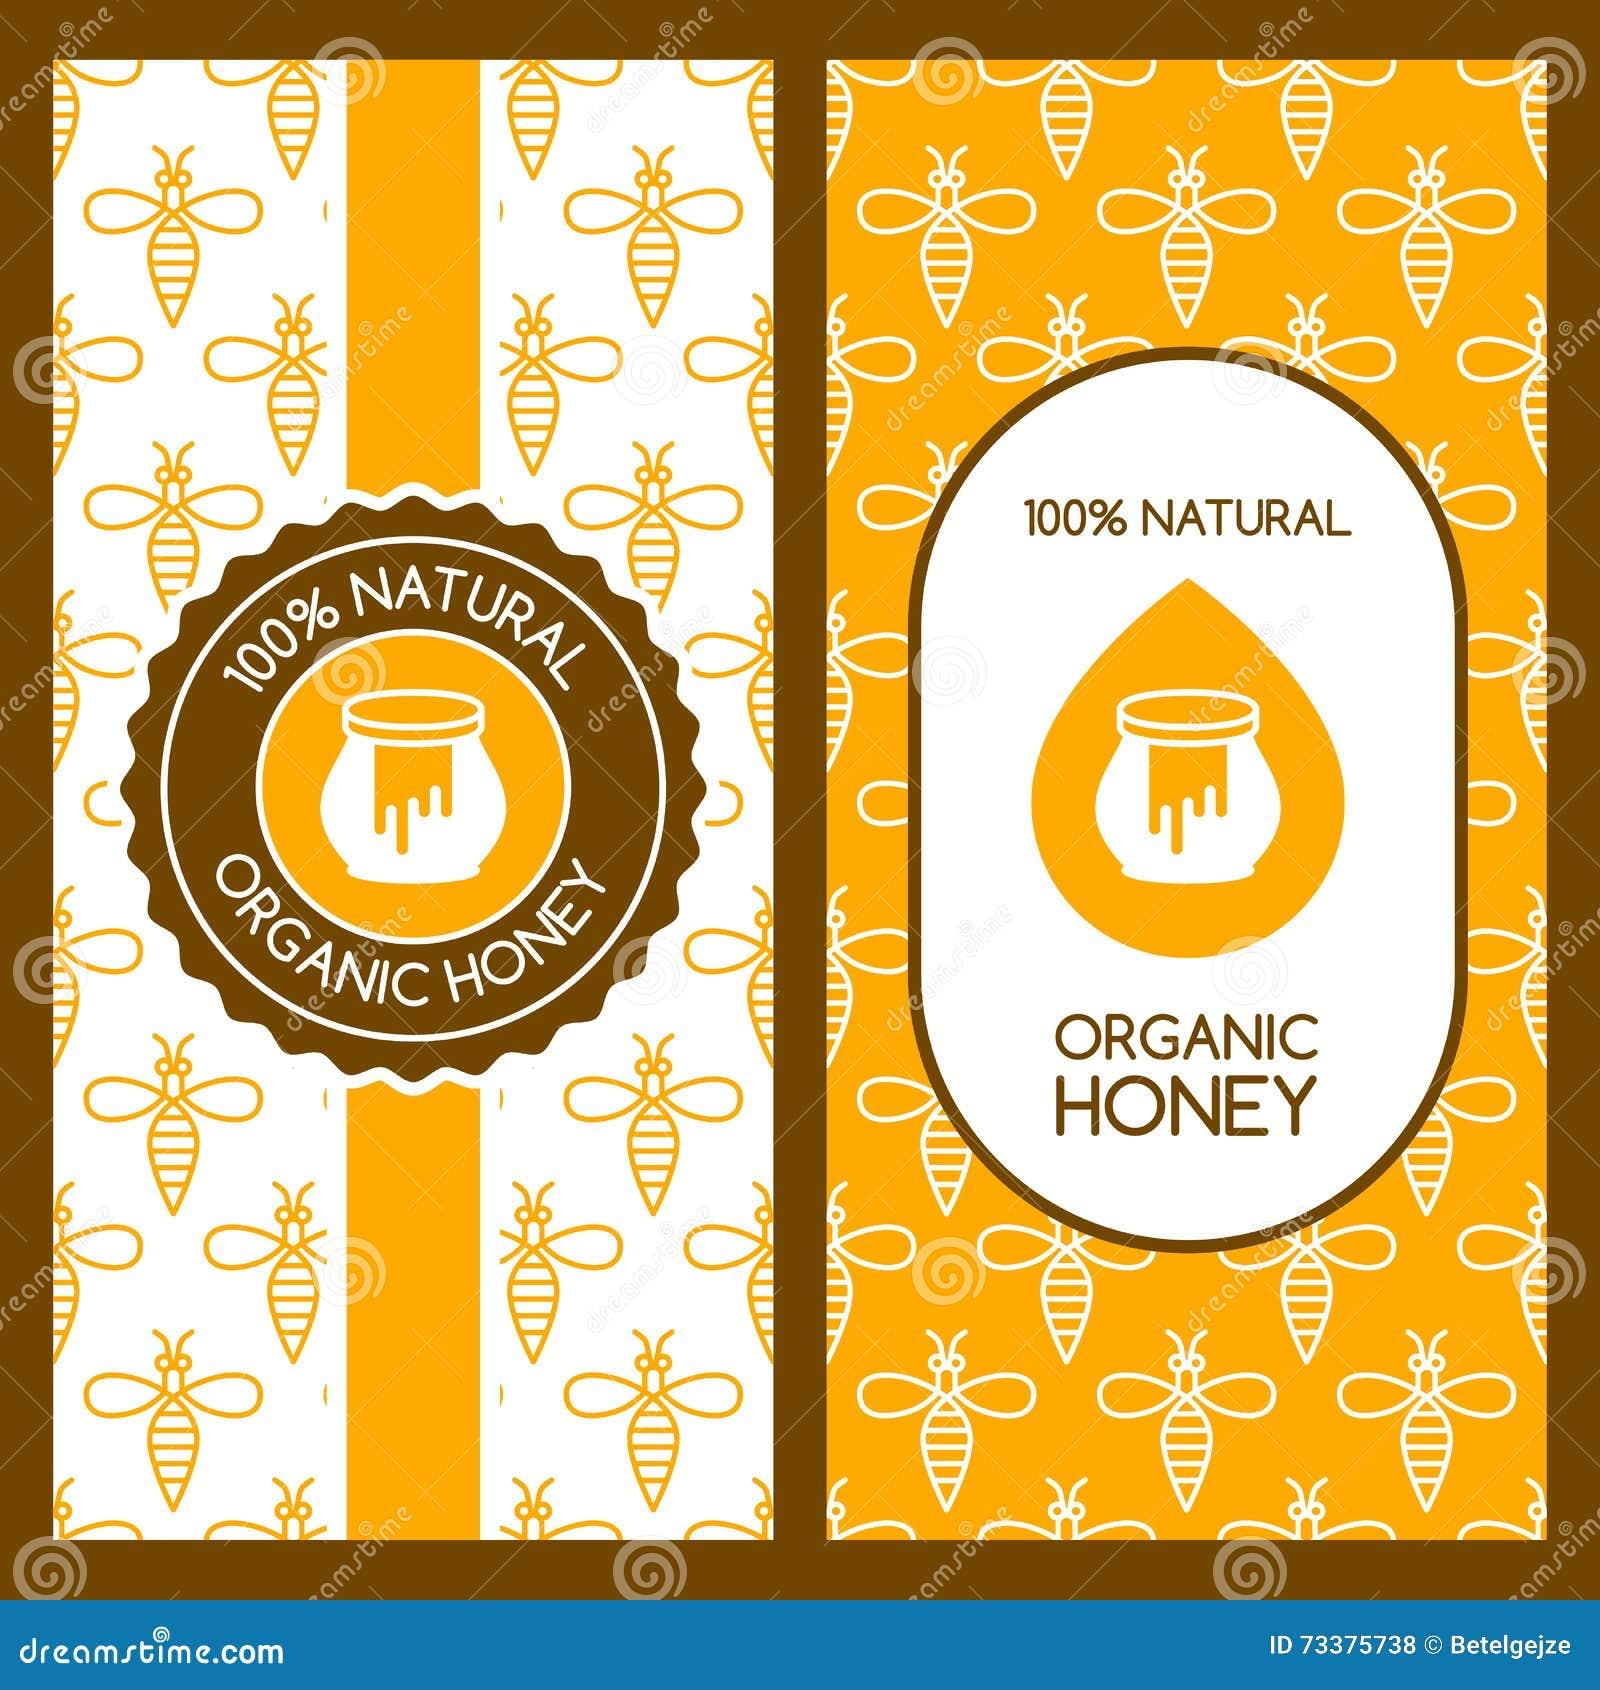 set of vector honey backgrounds for label package banner